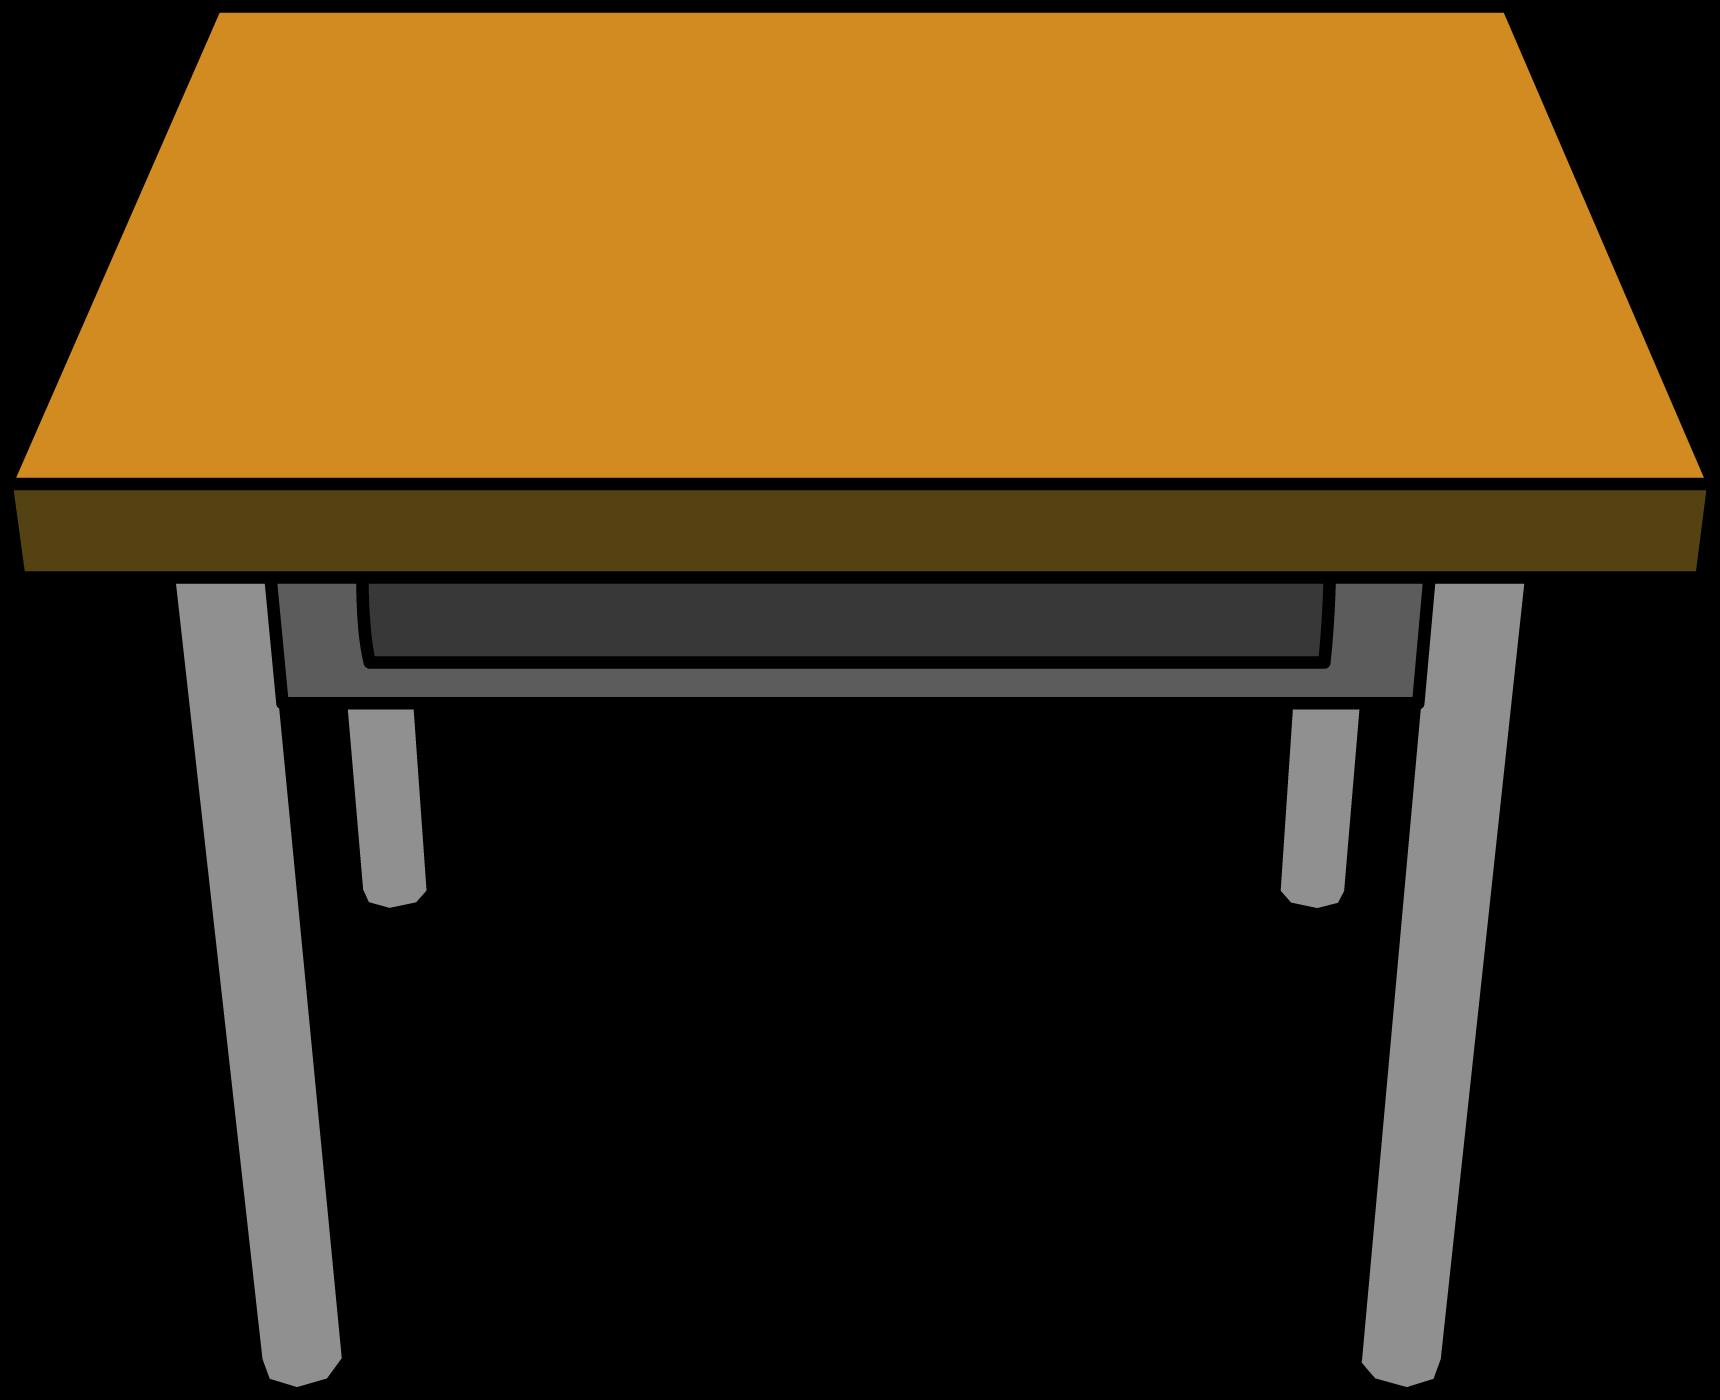 1720x1400 Furniture Clipart Classroom Desk